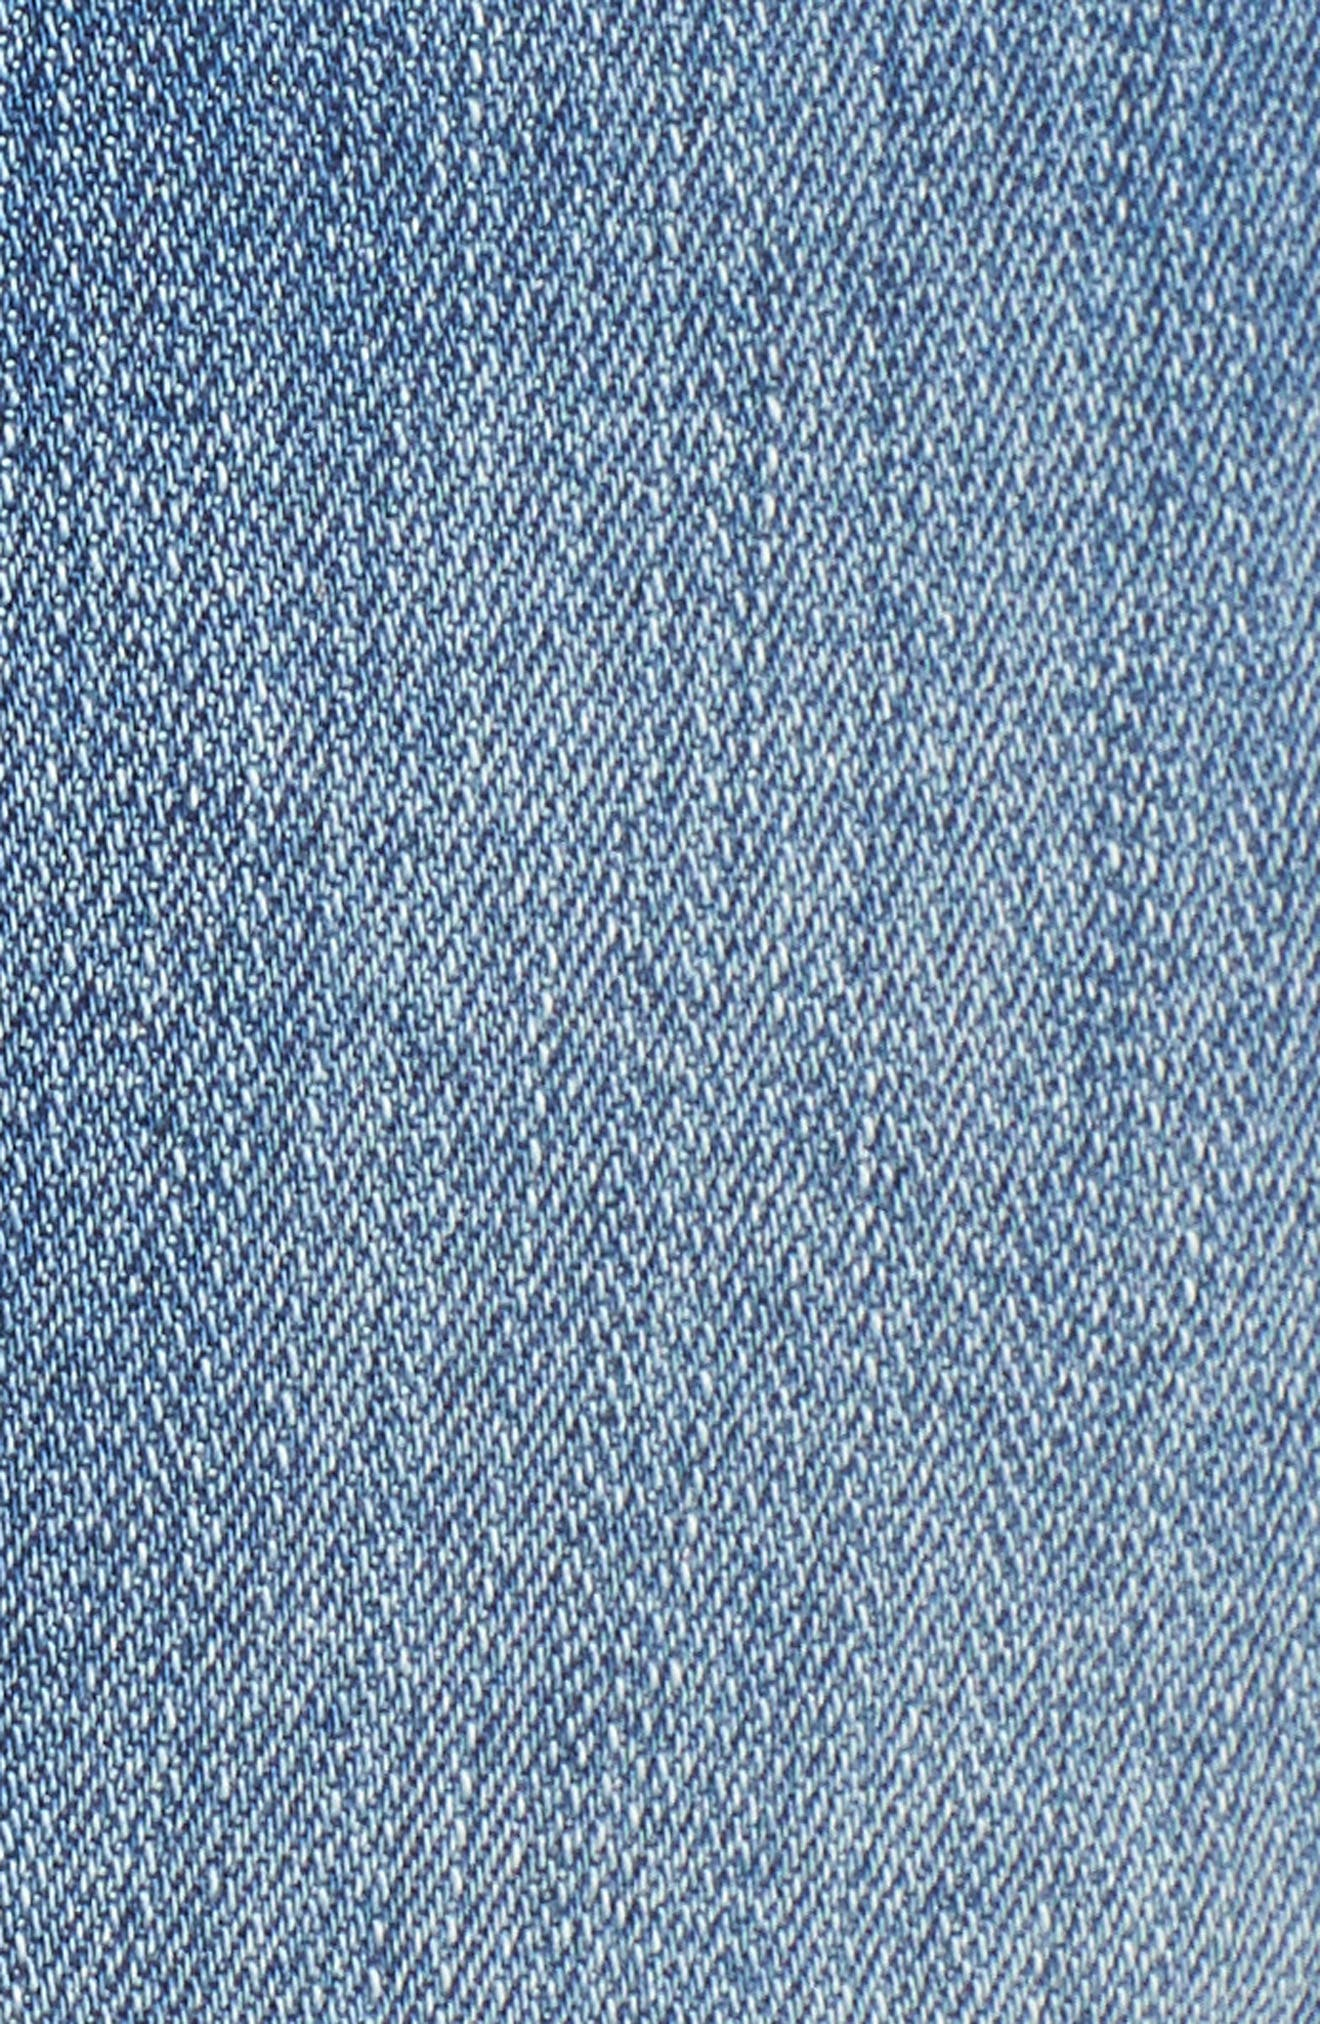 Rosebowl Shadow Pocket Denim Shorts,                             Alternate thumbnail 6, color,                             403